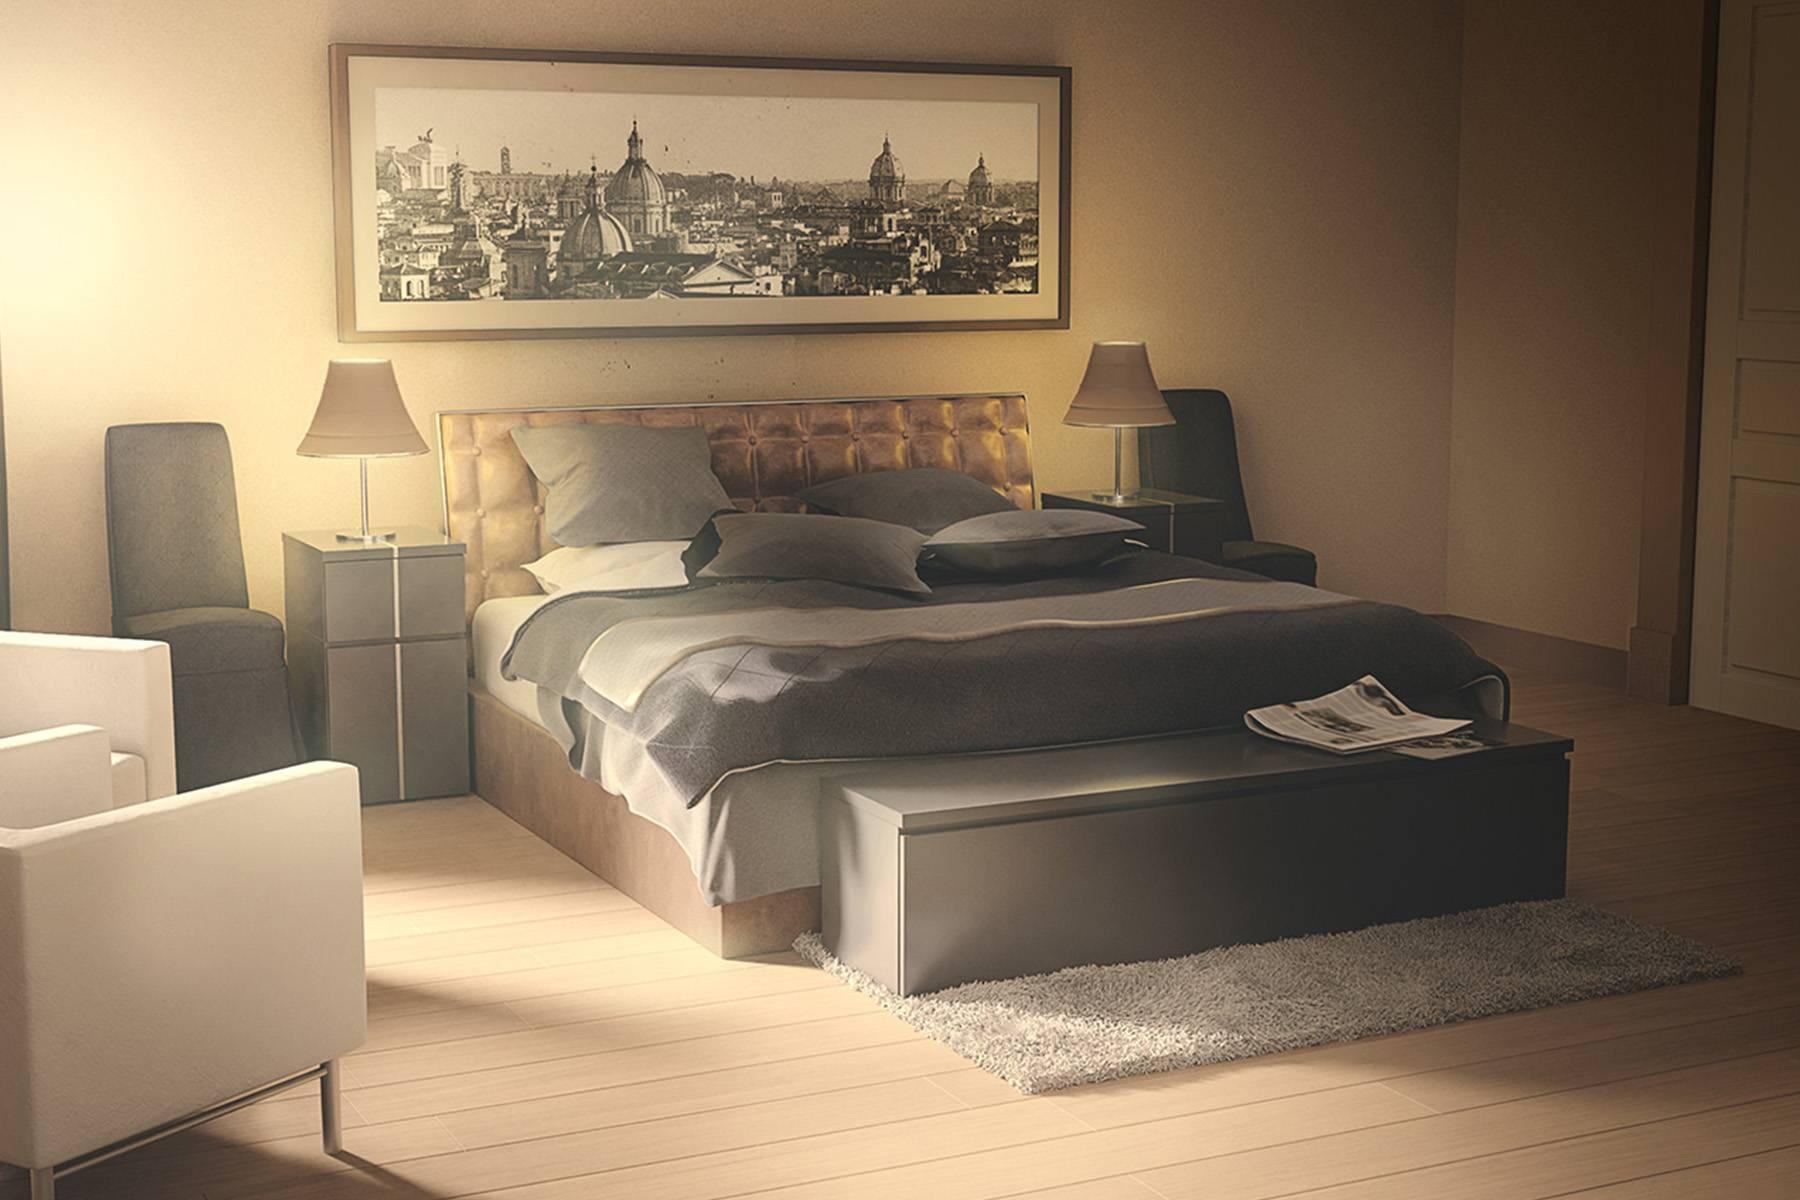 Spanish Steps luxury turnkey apartment - 19